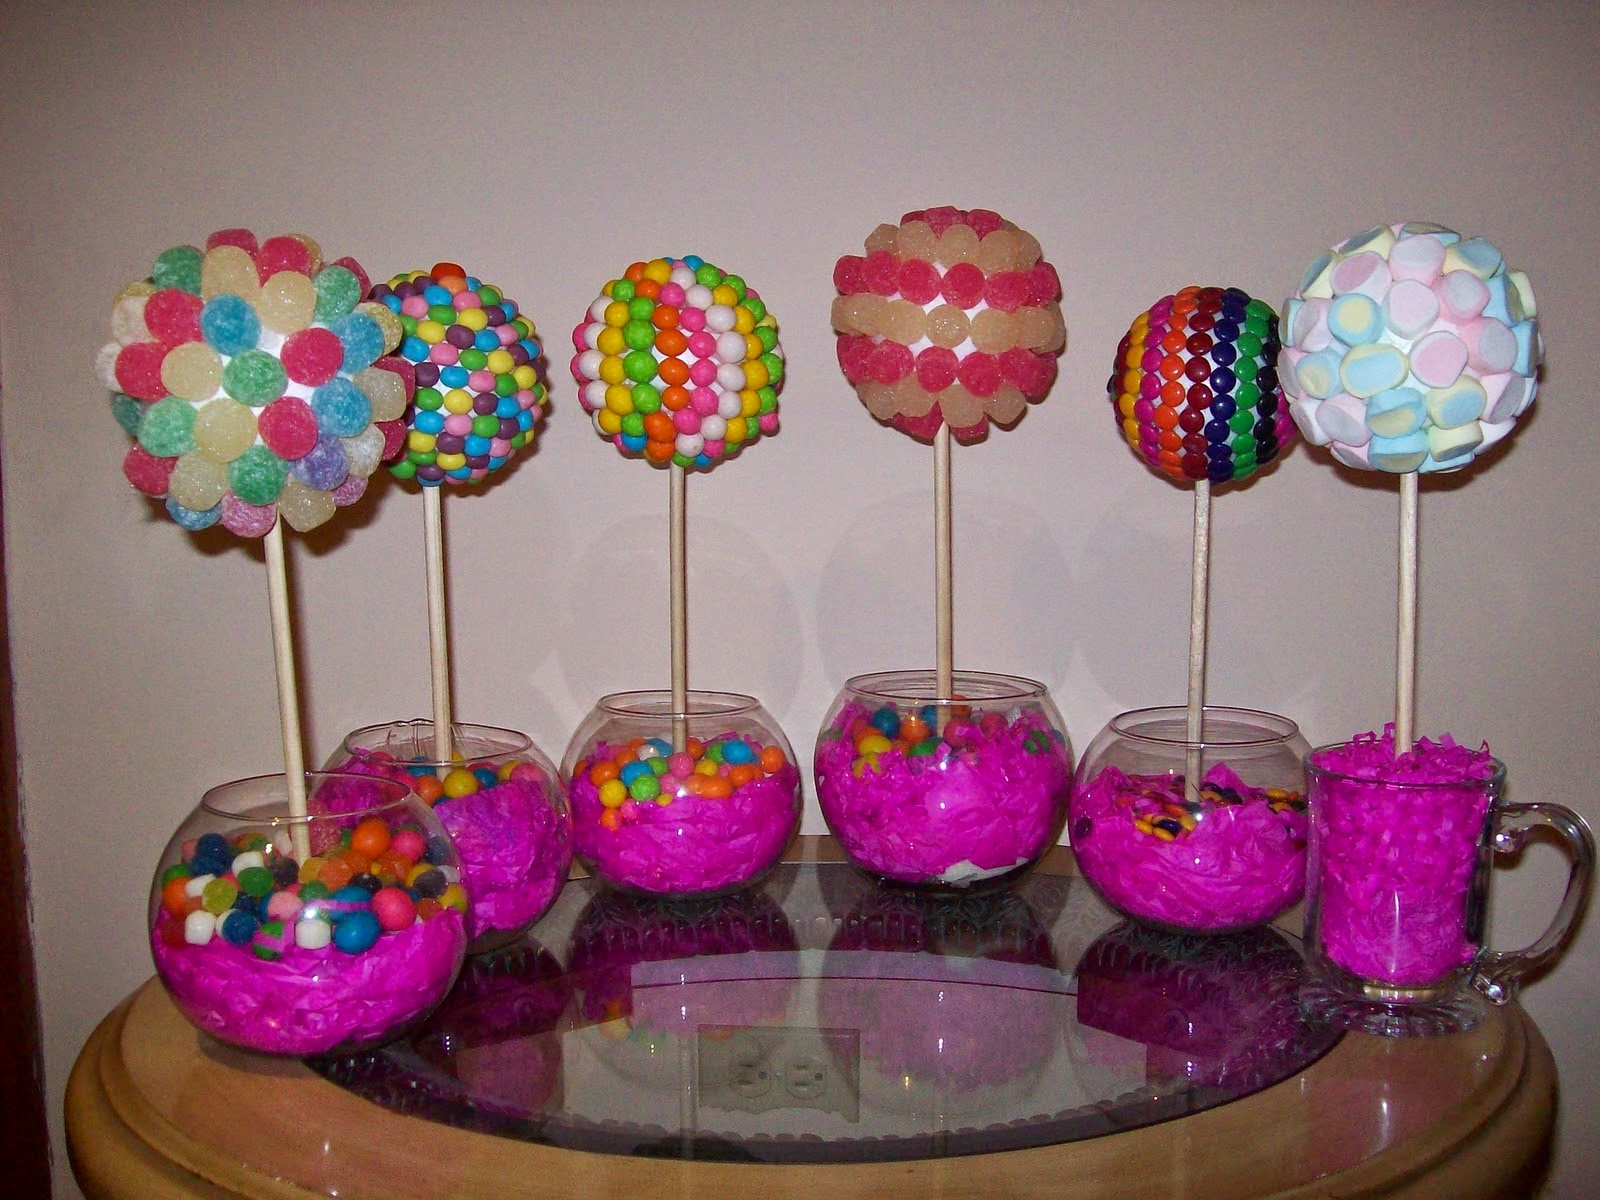 Dulce delirio noviembre 2014 for Decoracion mesas dulces